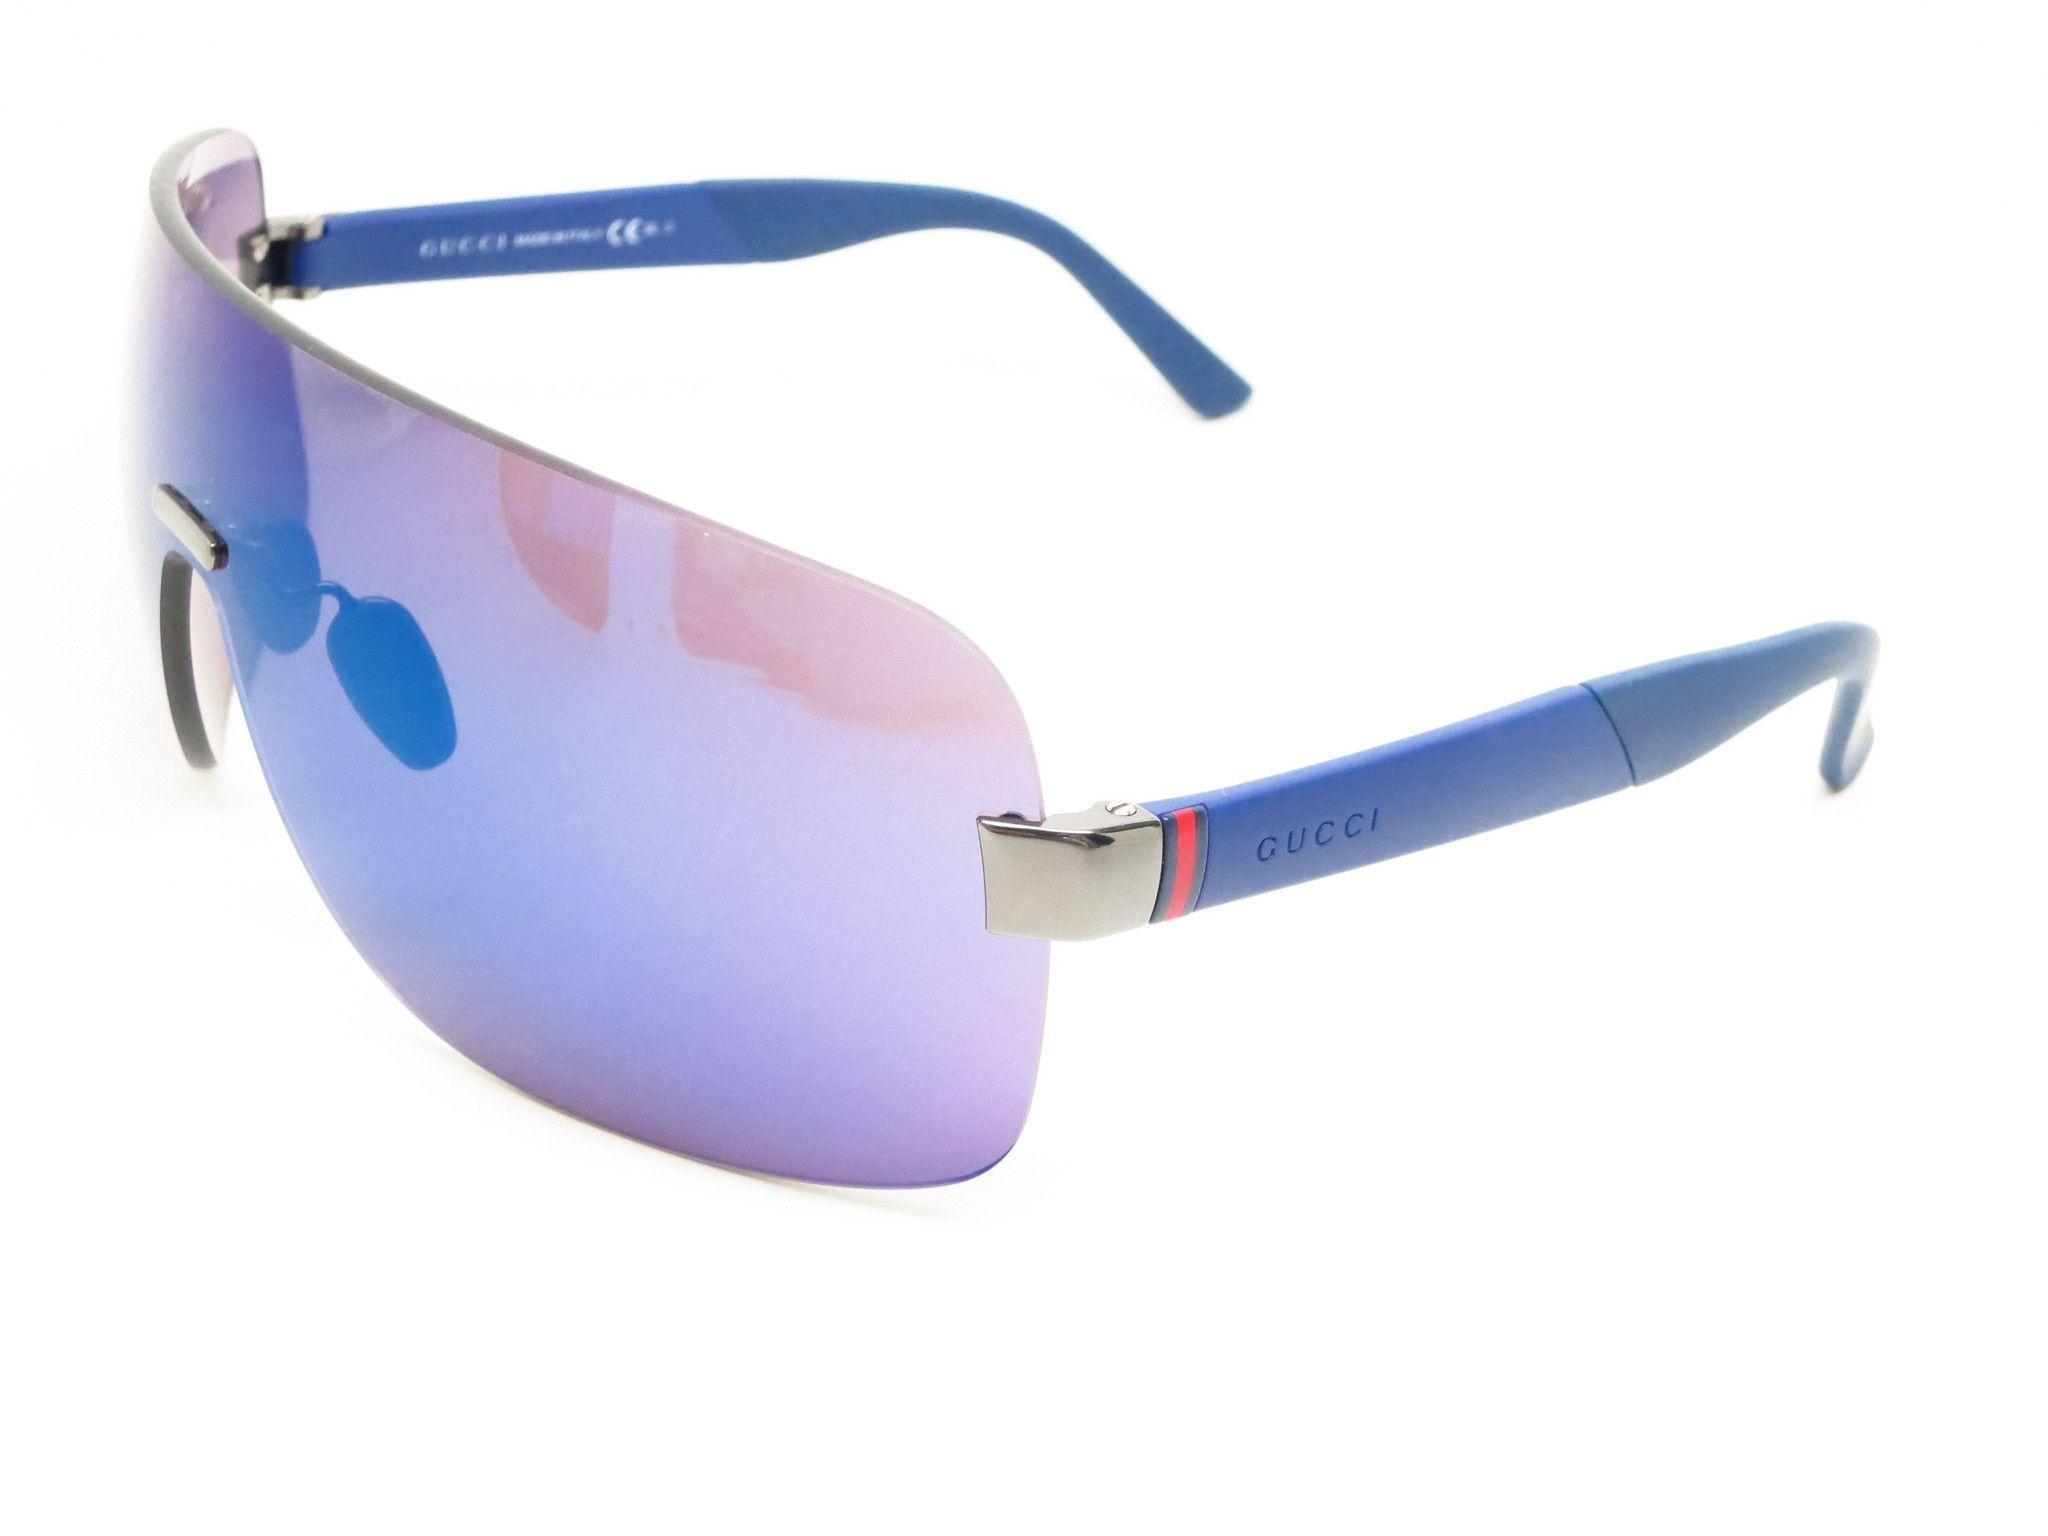 aa8023900d431 Gucci GG 2257 S JOMXT Ruthenium Blue Sunglasses